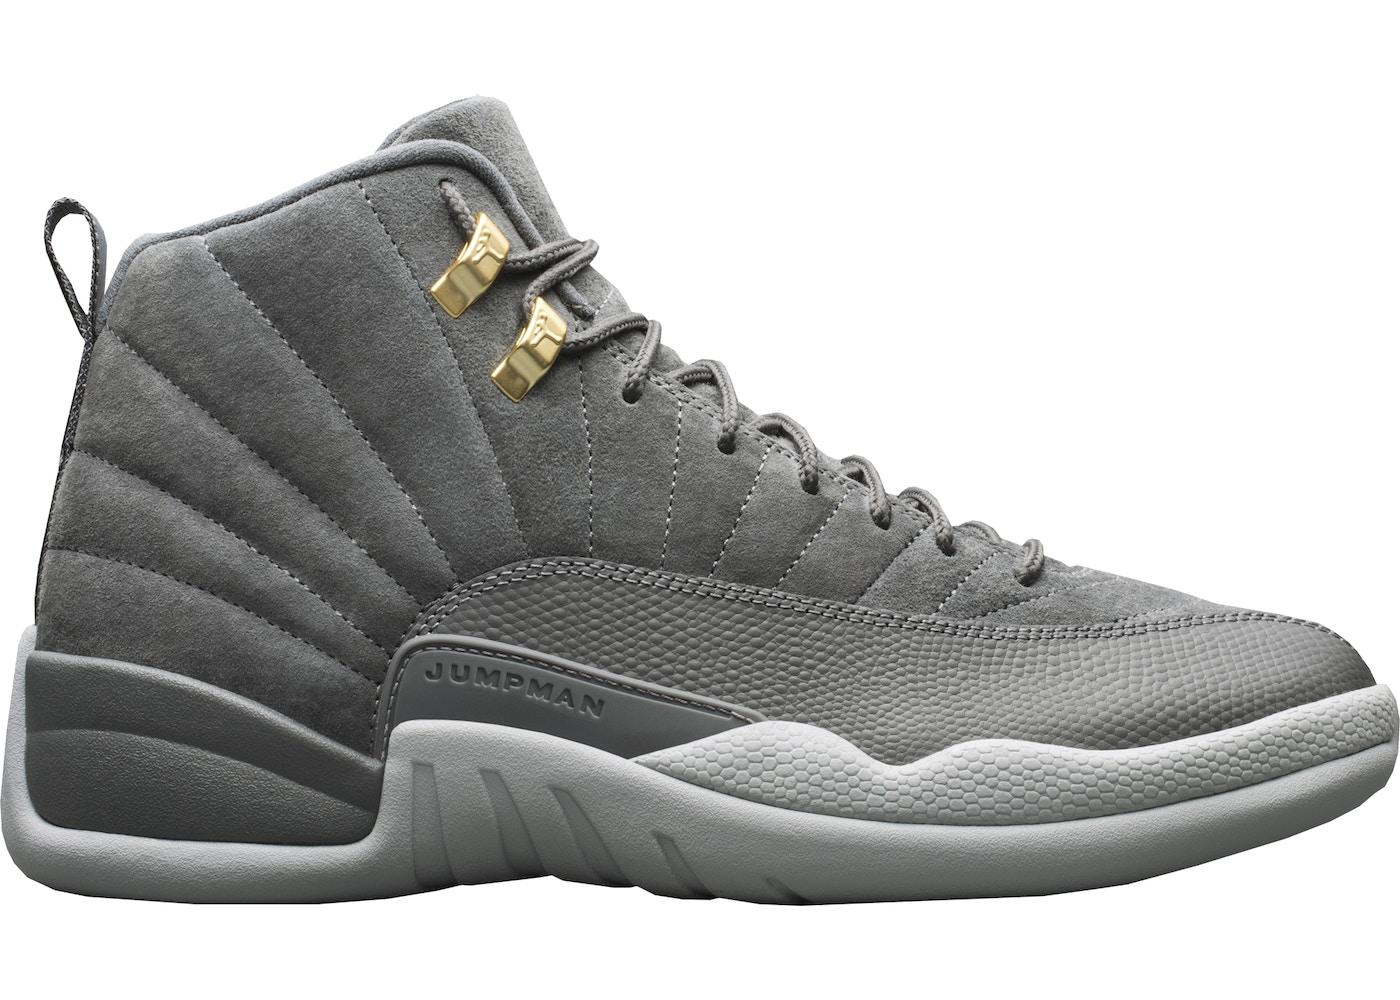 Jordan Xii Shoes